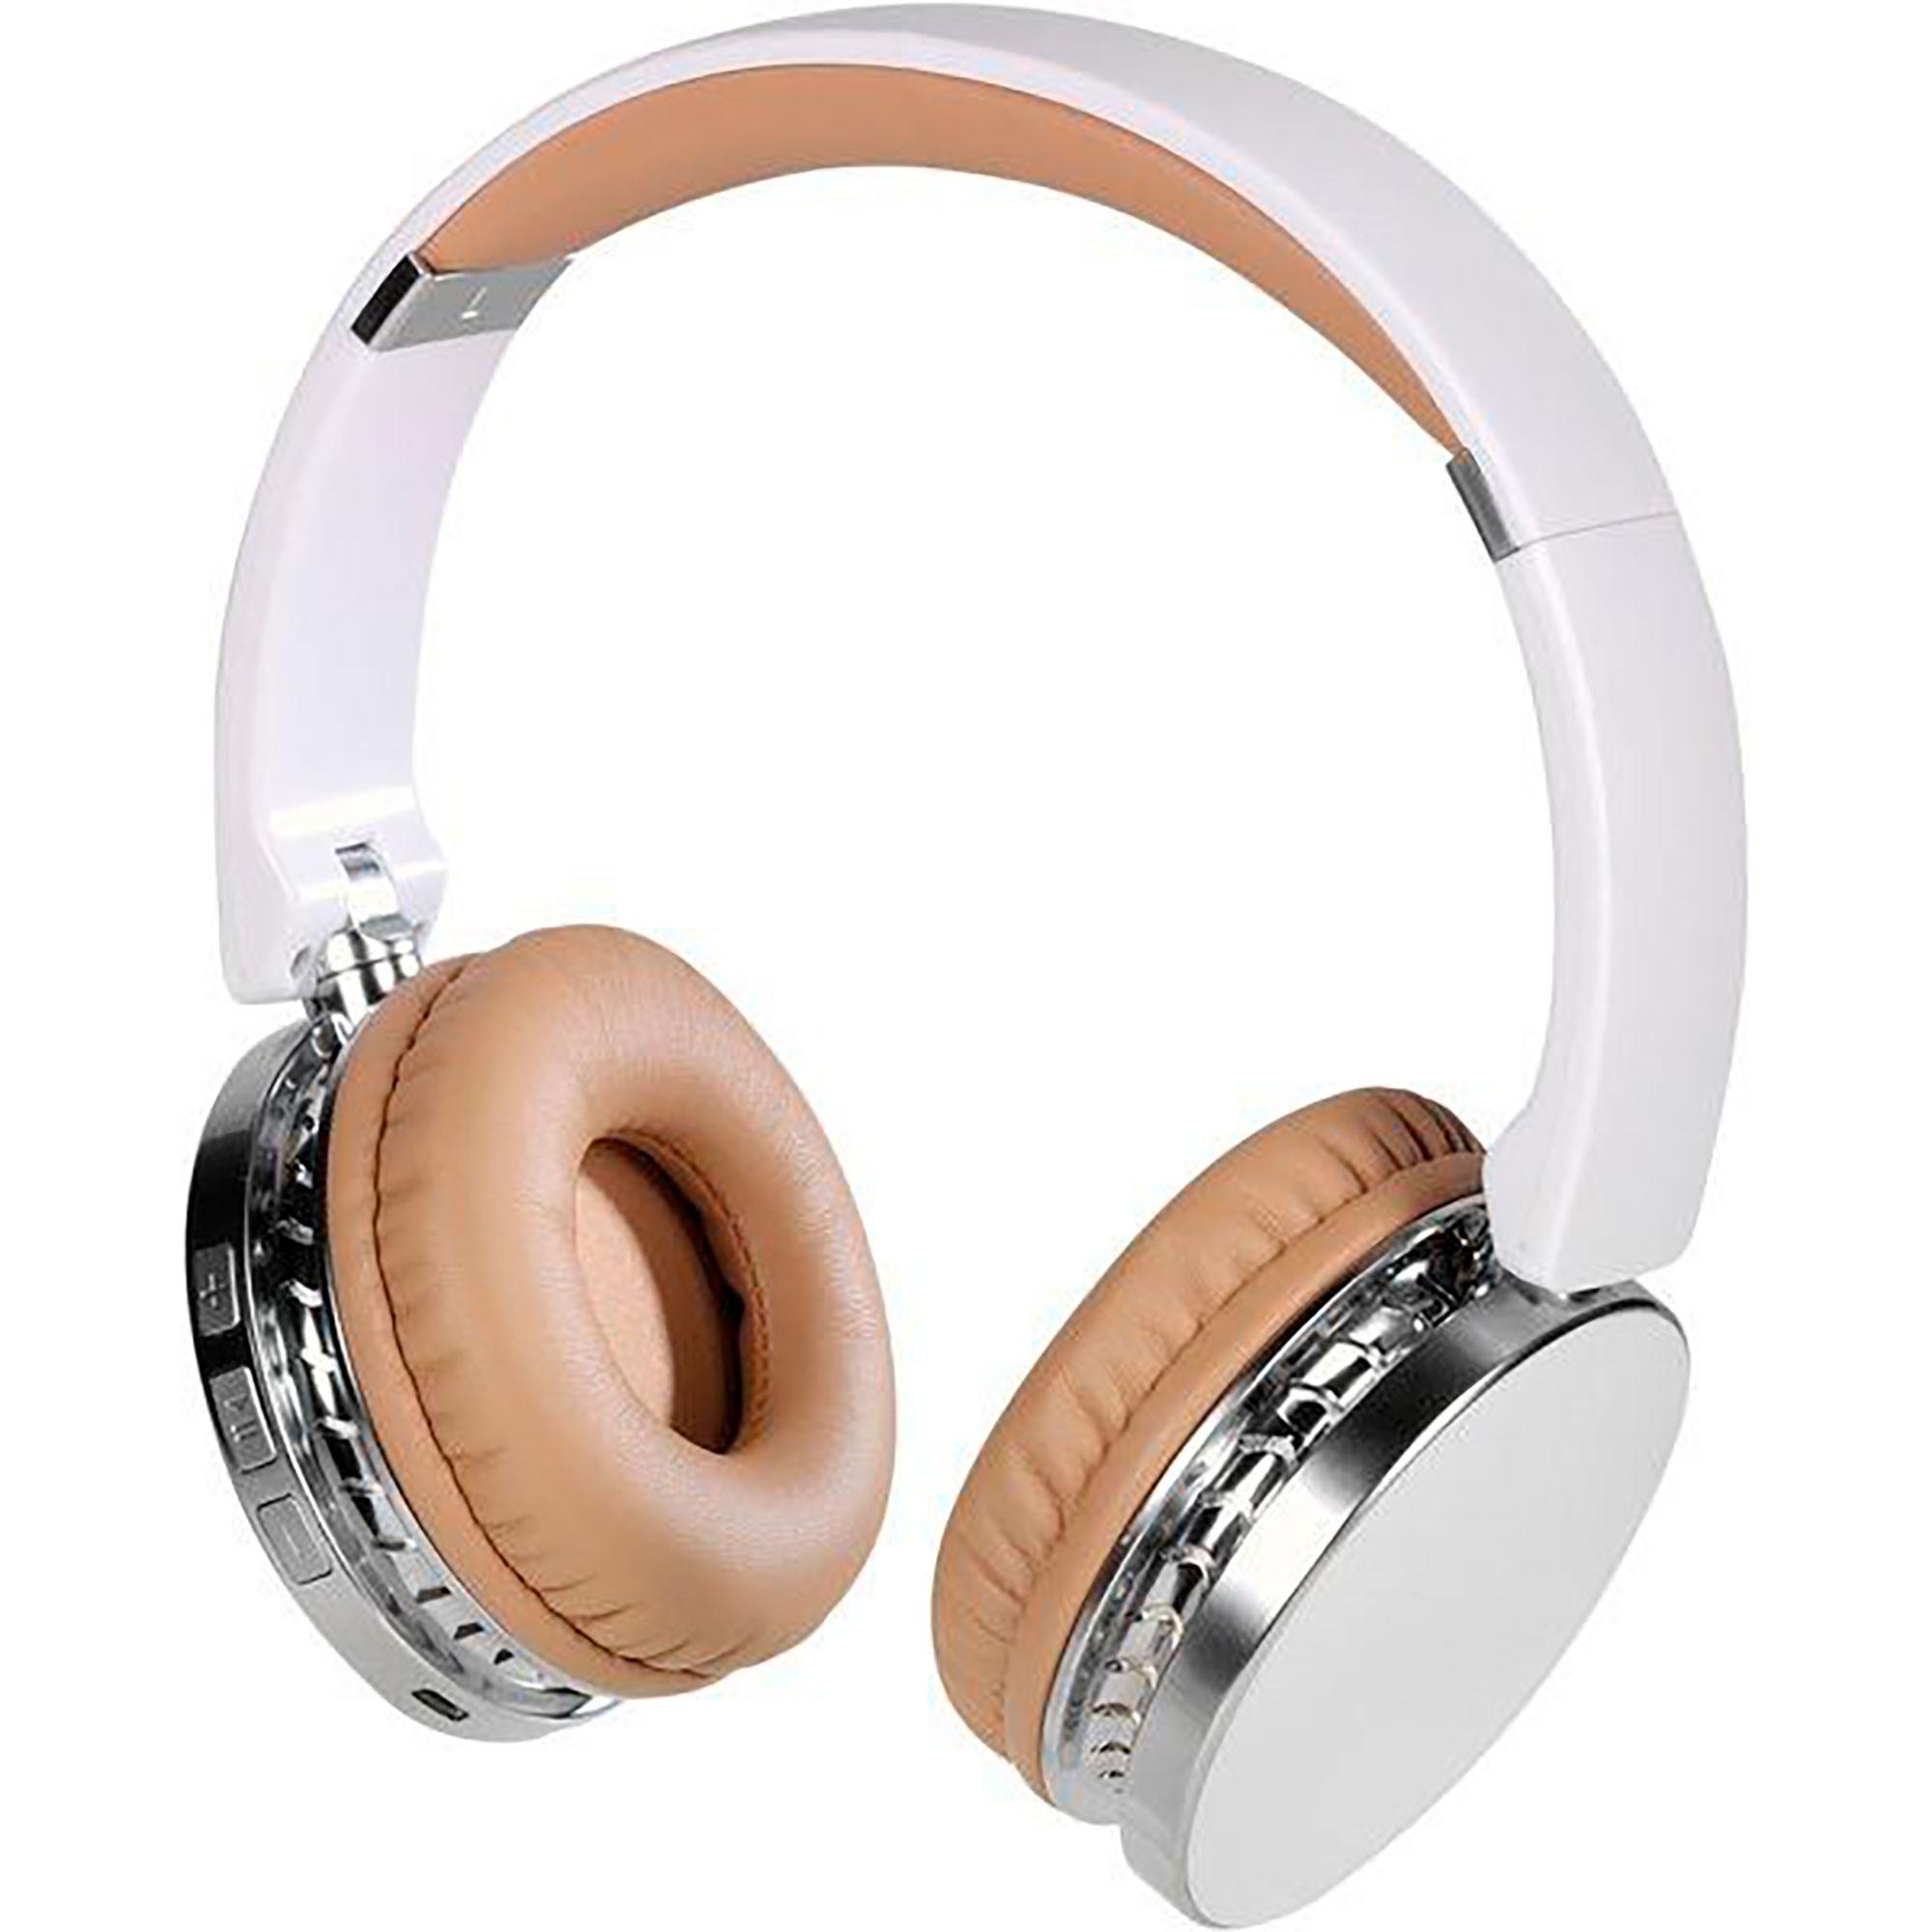 Vivanco Neos Air Auriculares de Diadema, Bluetooth, Inalámbricos, Manos Libres, 8h de Autonomía, Sonido de Alta Calidad, Blanco